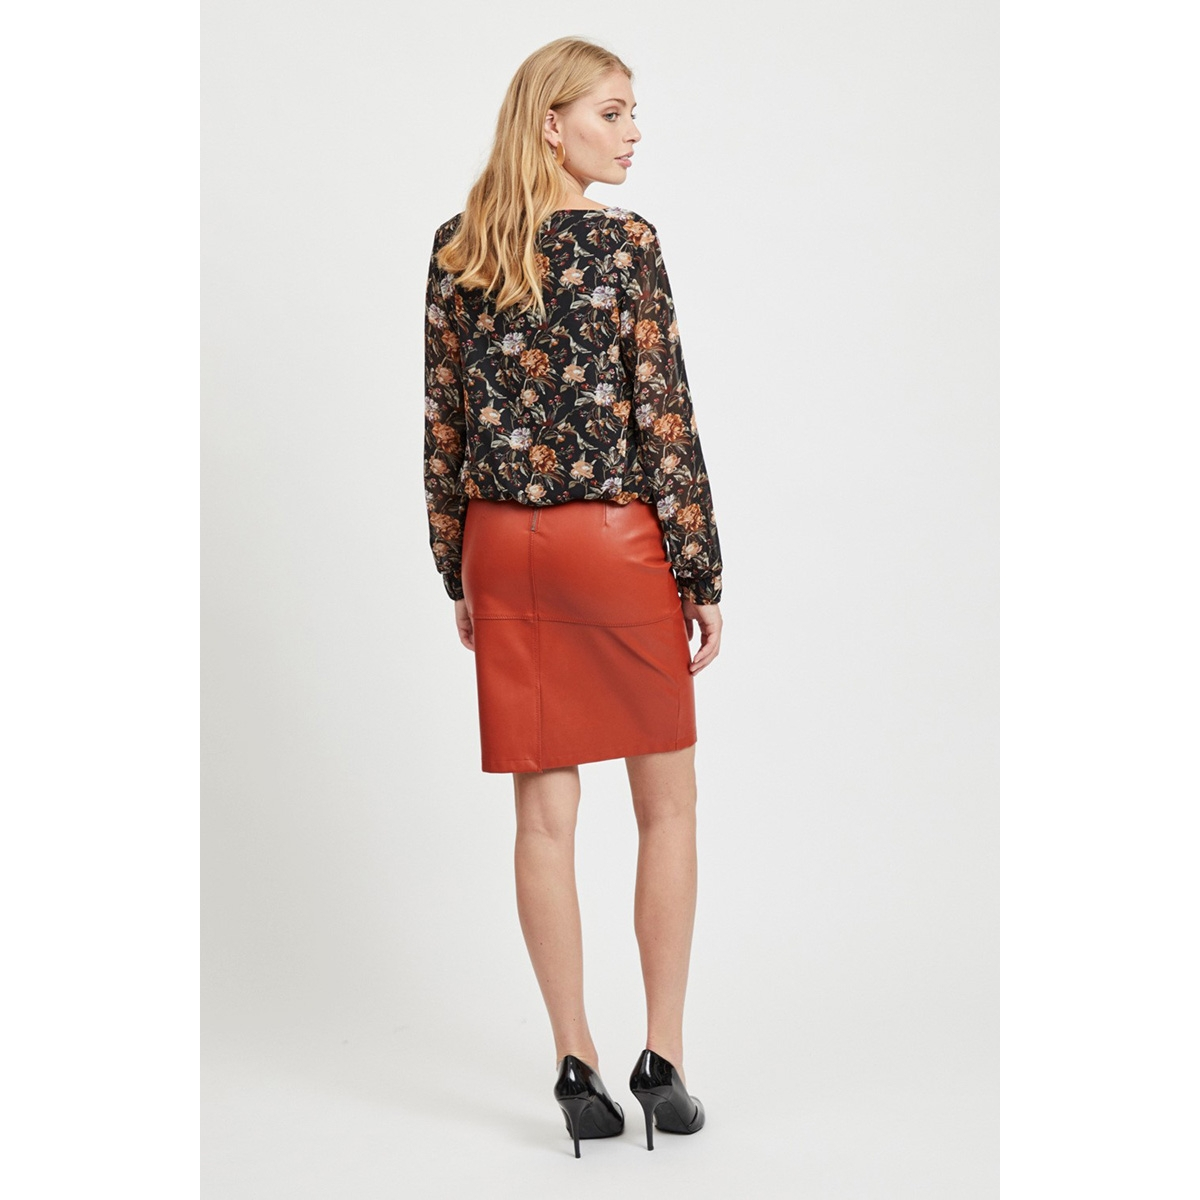 vipen new skirt noos 14033417 vila rok ketchup